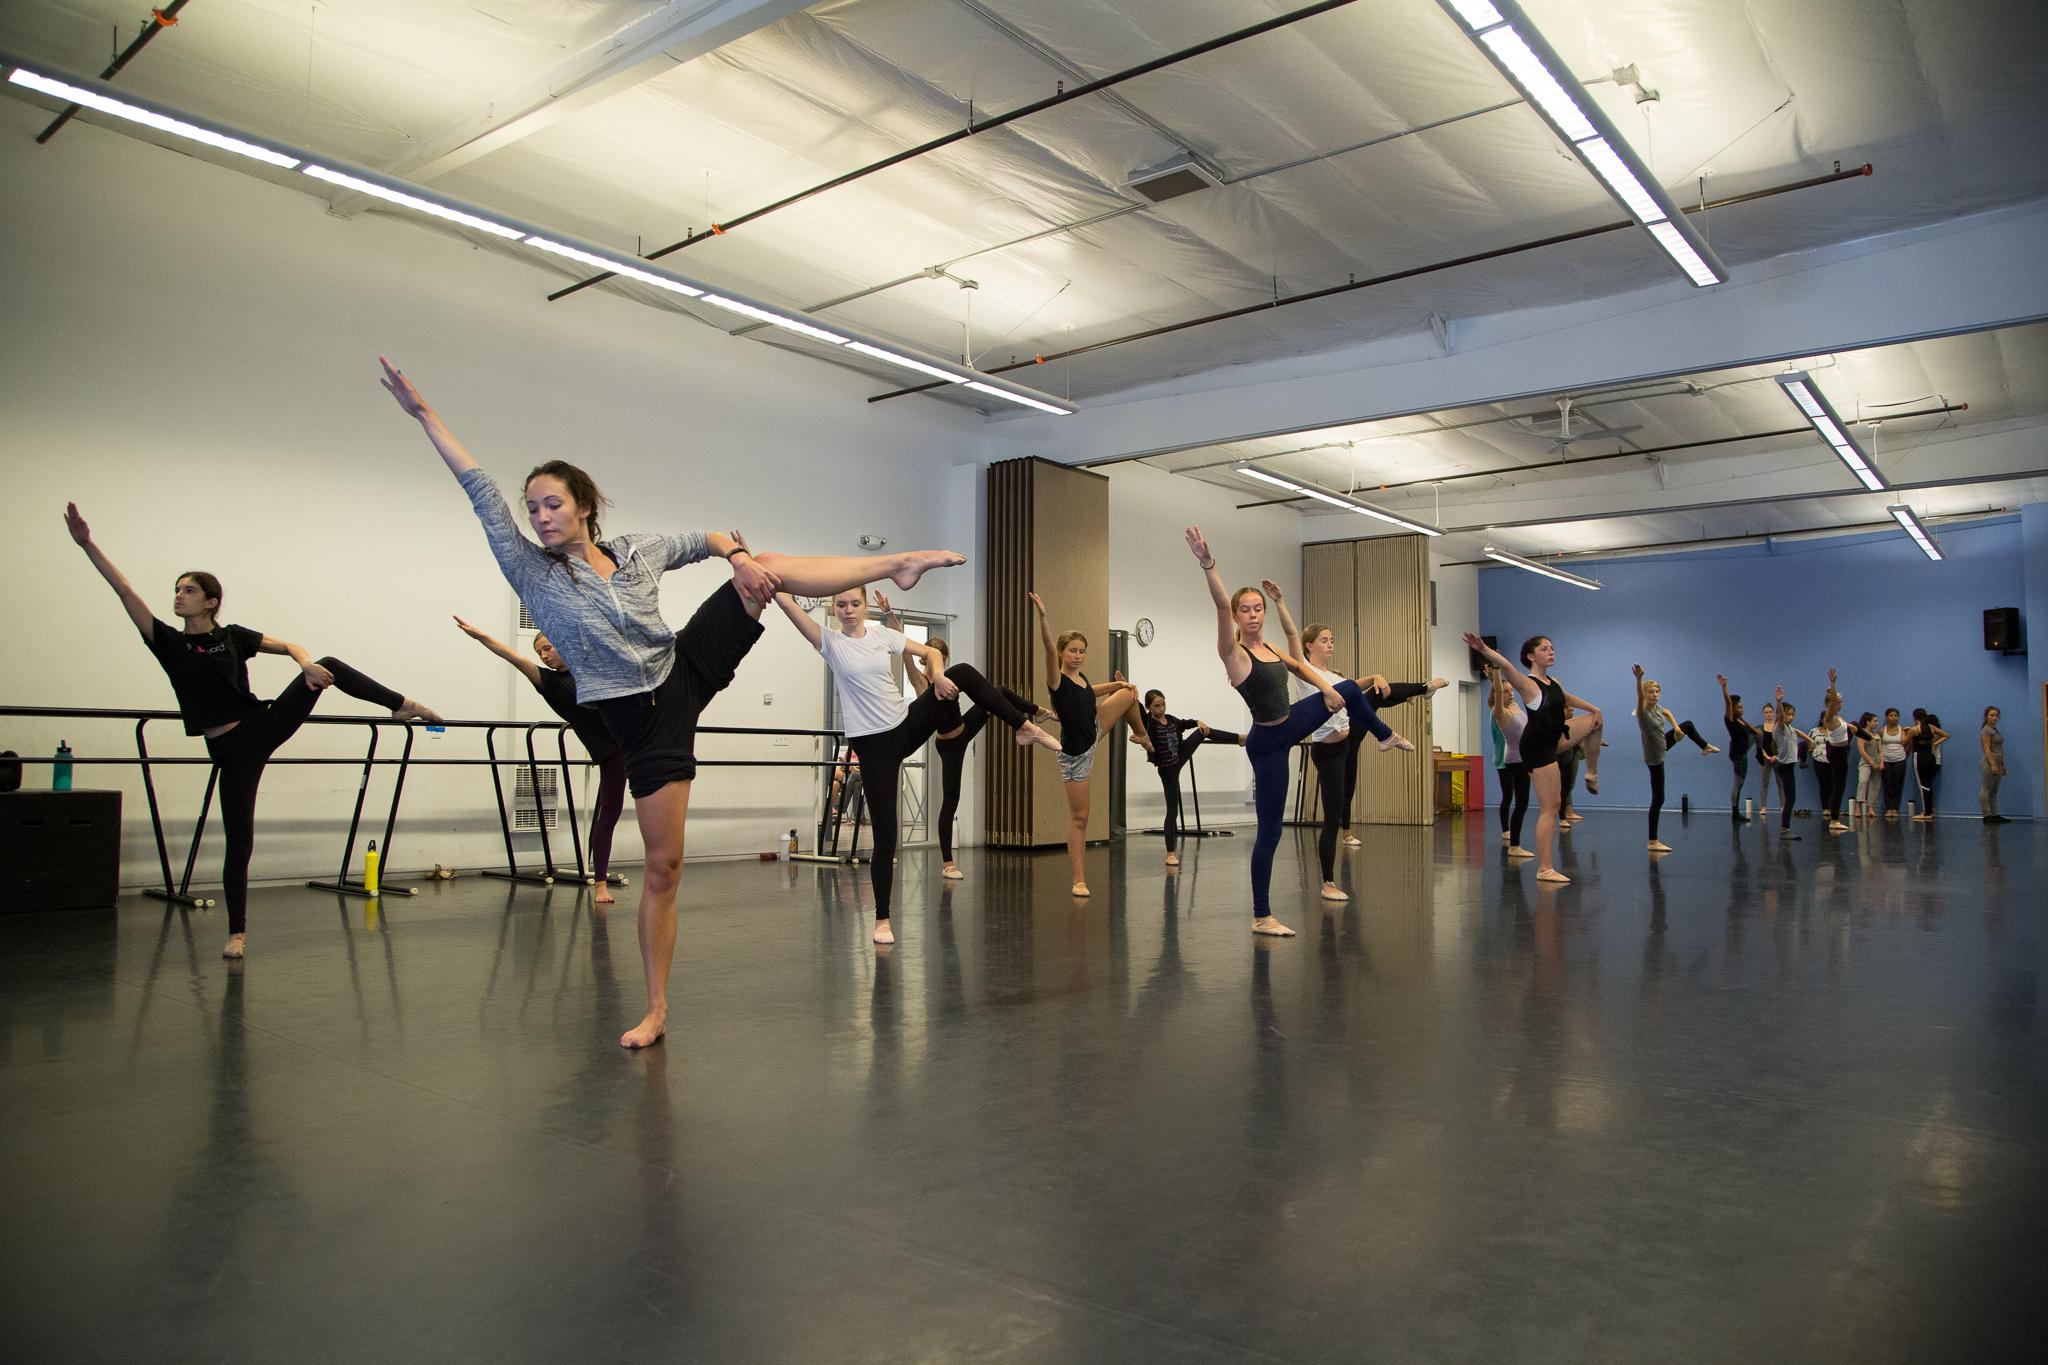 dance studio rental santa barbara, performance and exhibition space